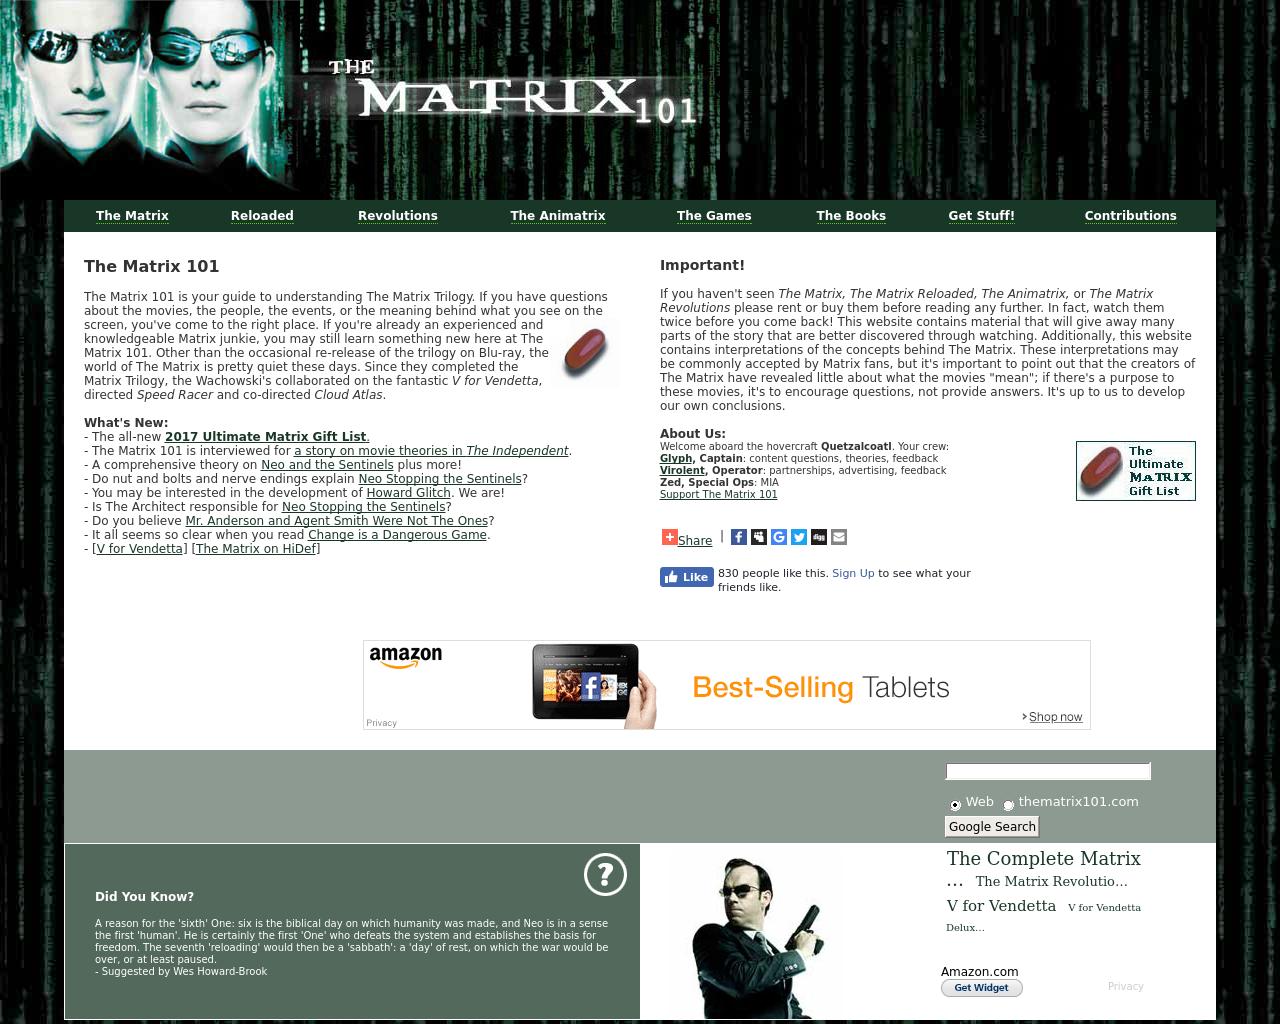 The-Matrix-101-Advertising-Reviews-Pricing